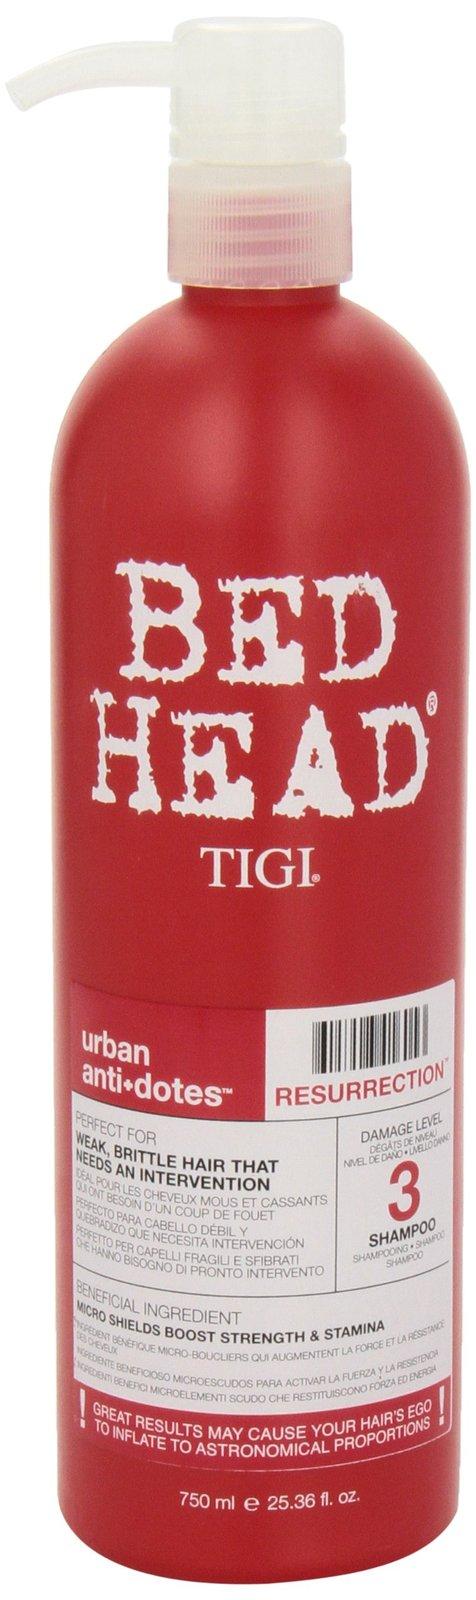 Tigi Bed Head Urban Anti+dotes Resurrection Shampoo Damage Level 3, 25.36 Ounce